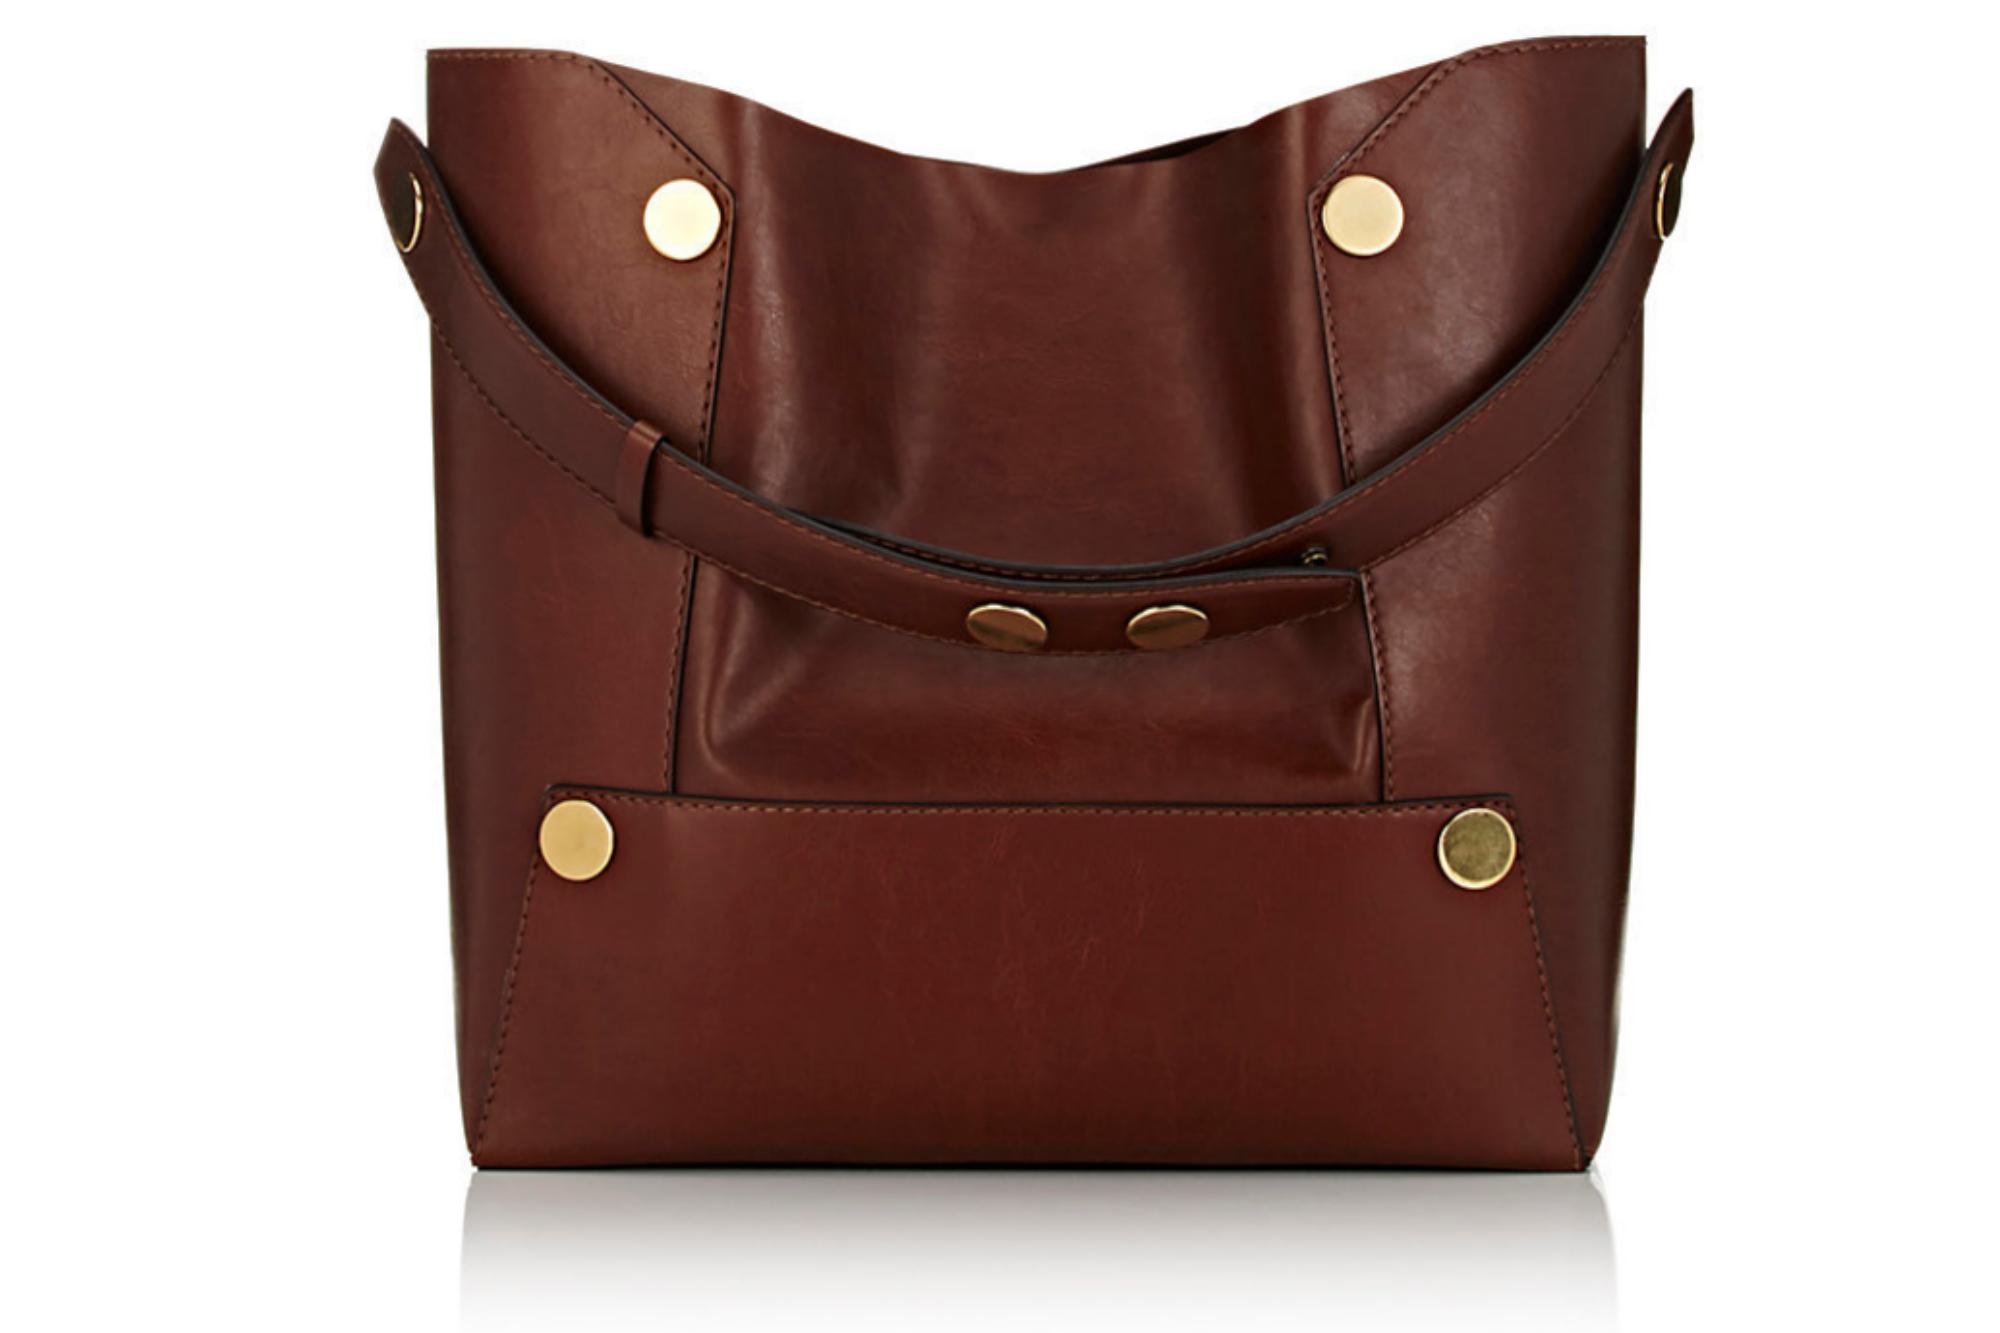 Stella McCartney Bucket Bag